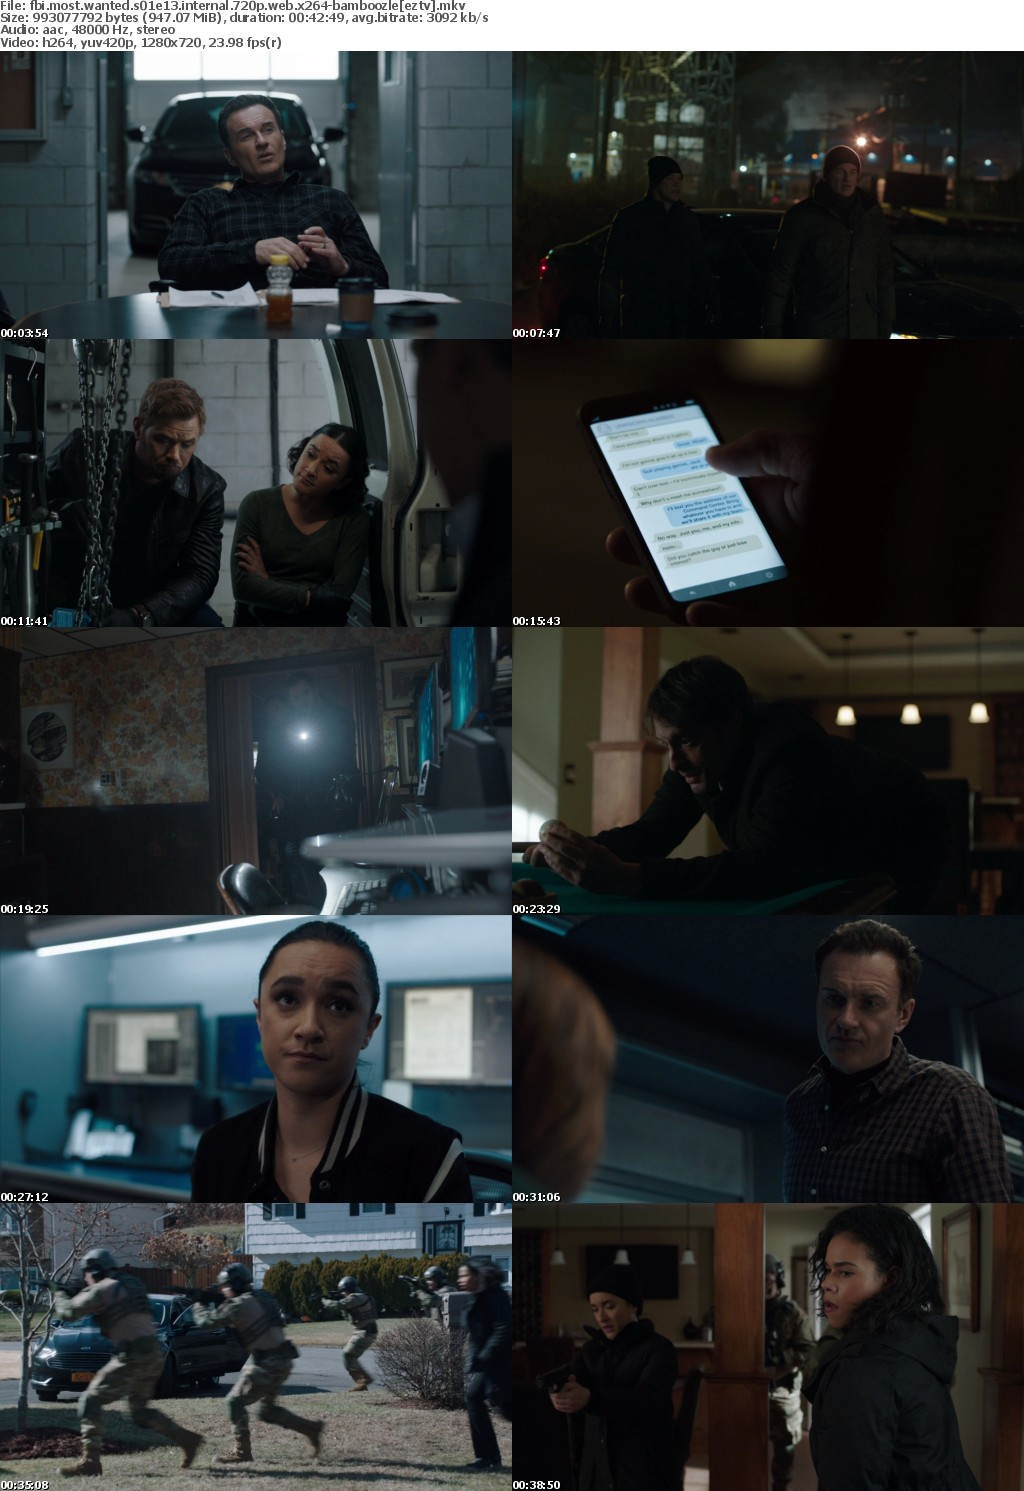 FBI Most Wanted S01E13 iNTERNAL 720p WEB x264-BAMBOOZLE